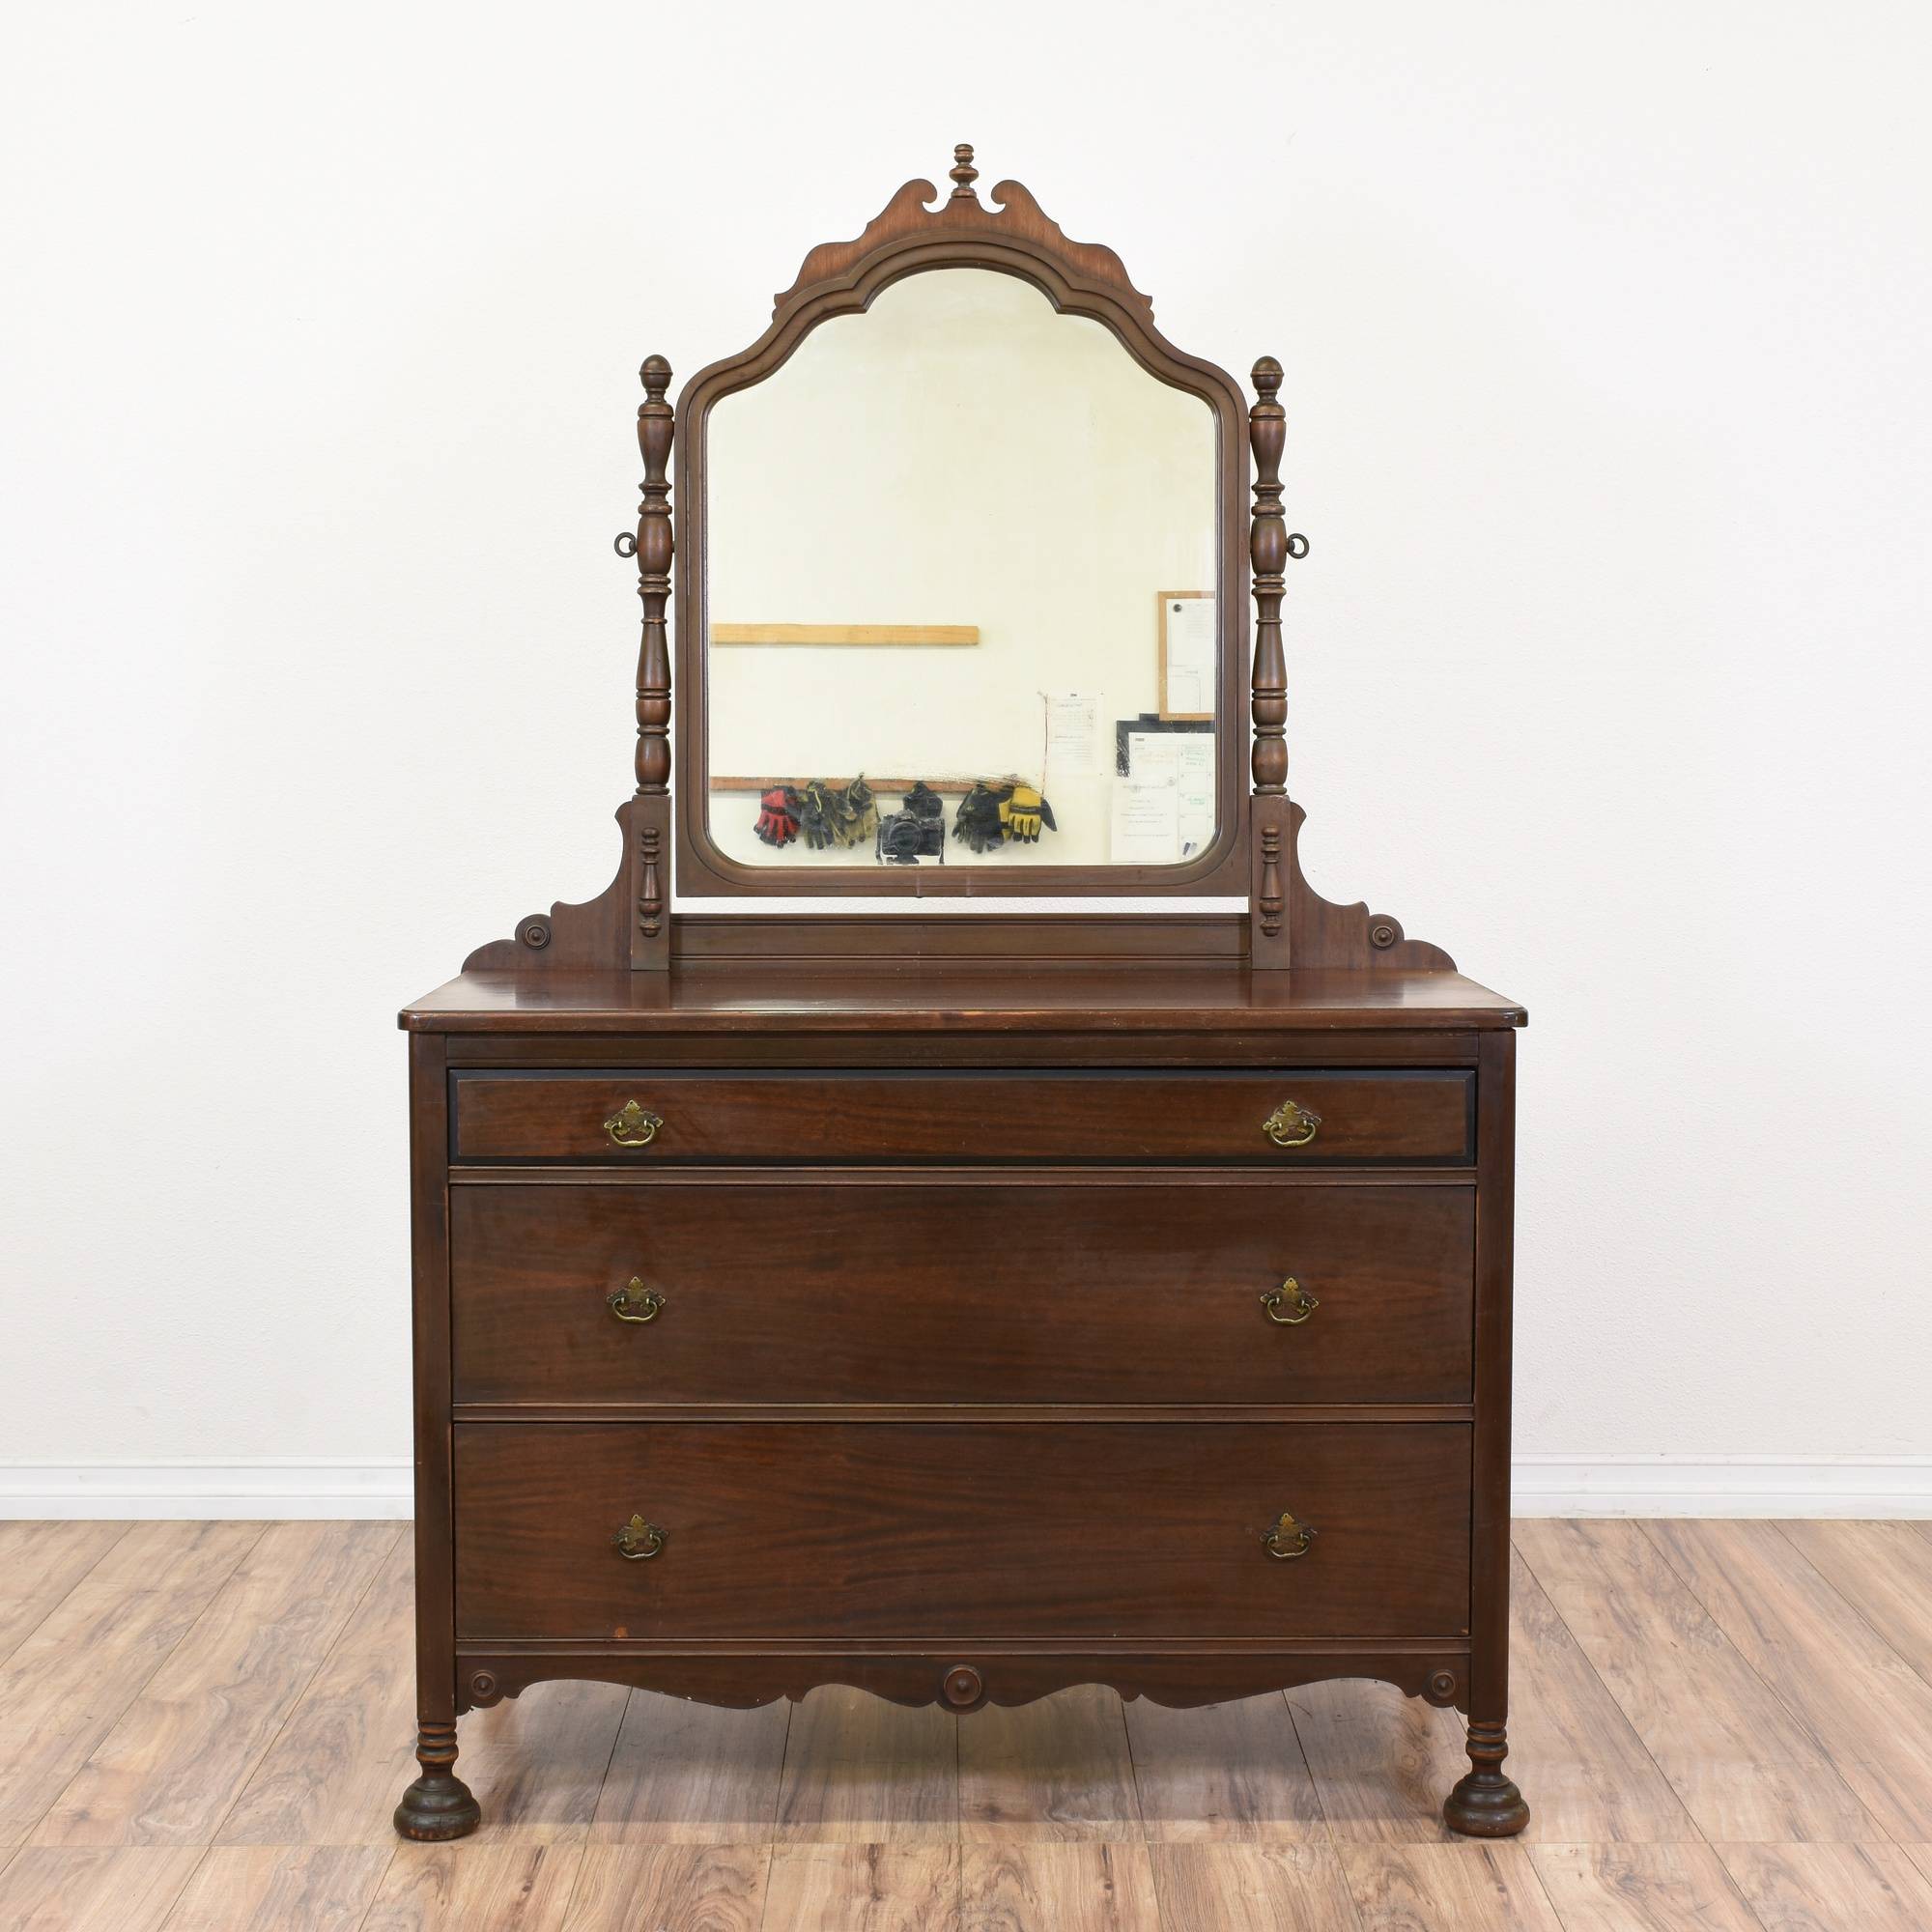 W Furniture: Carved Walnut Vanity Dresser W/ Mirror